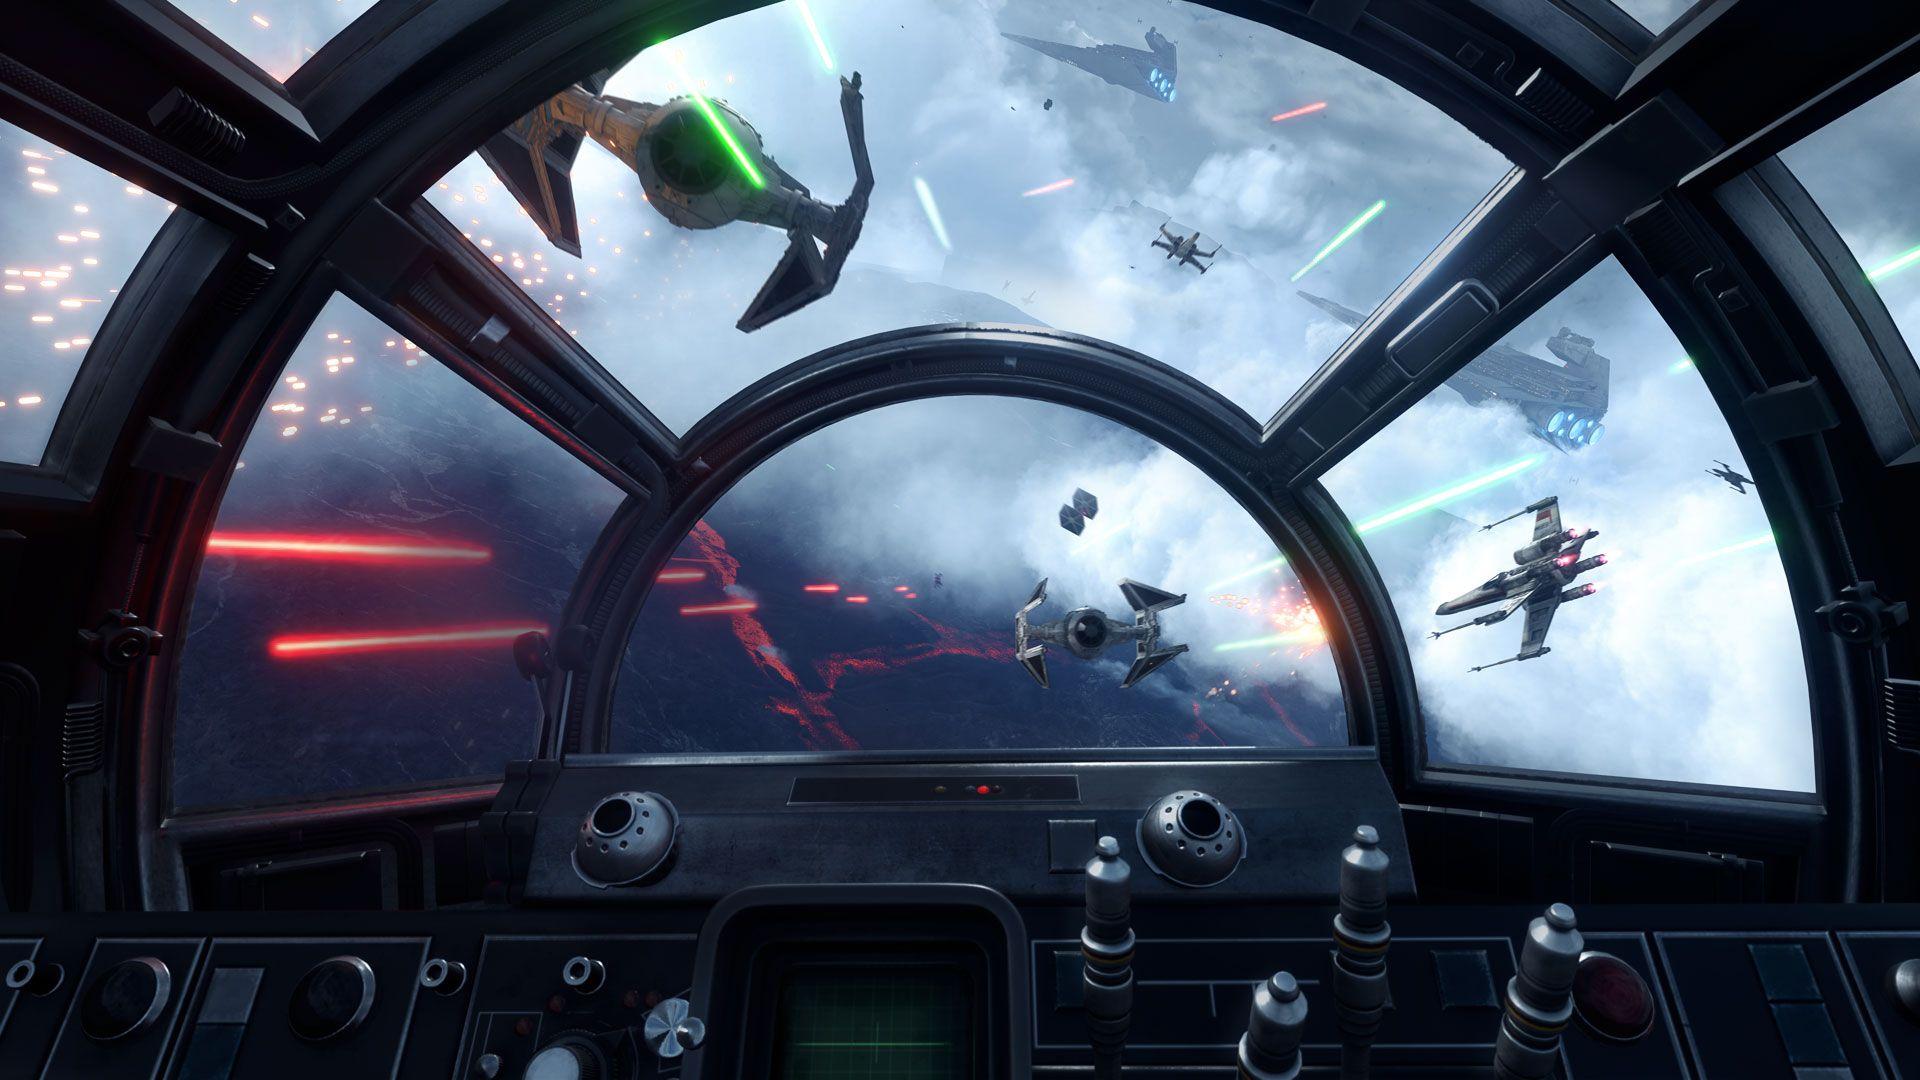 Displaying images for millenium falcon cockpit wallpaper - Star Wars Battlefront Millenium Falcon Cockpit View